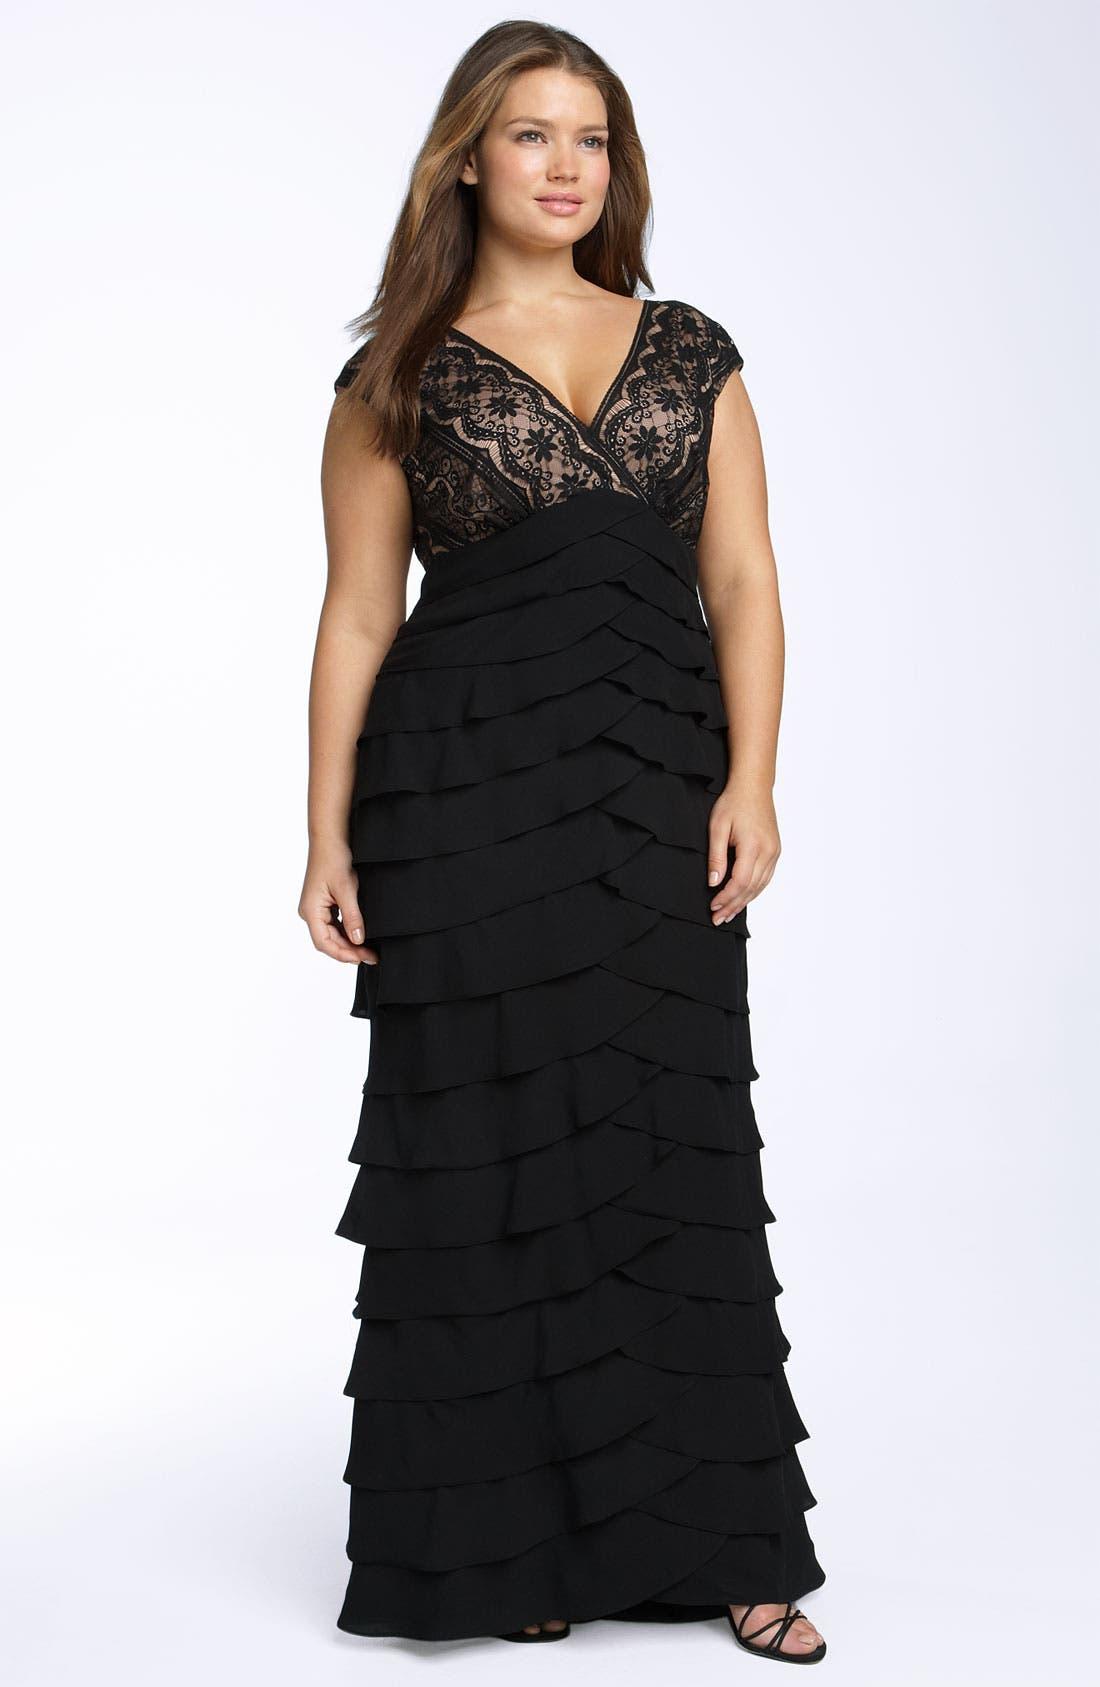 Dresses for women party plus size